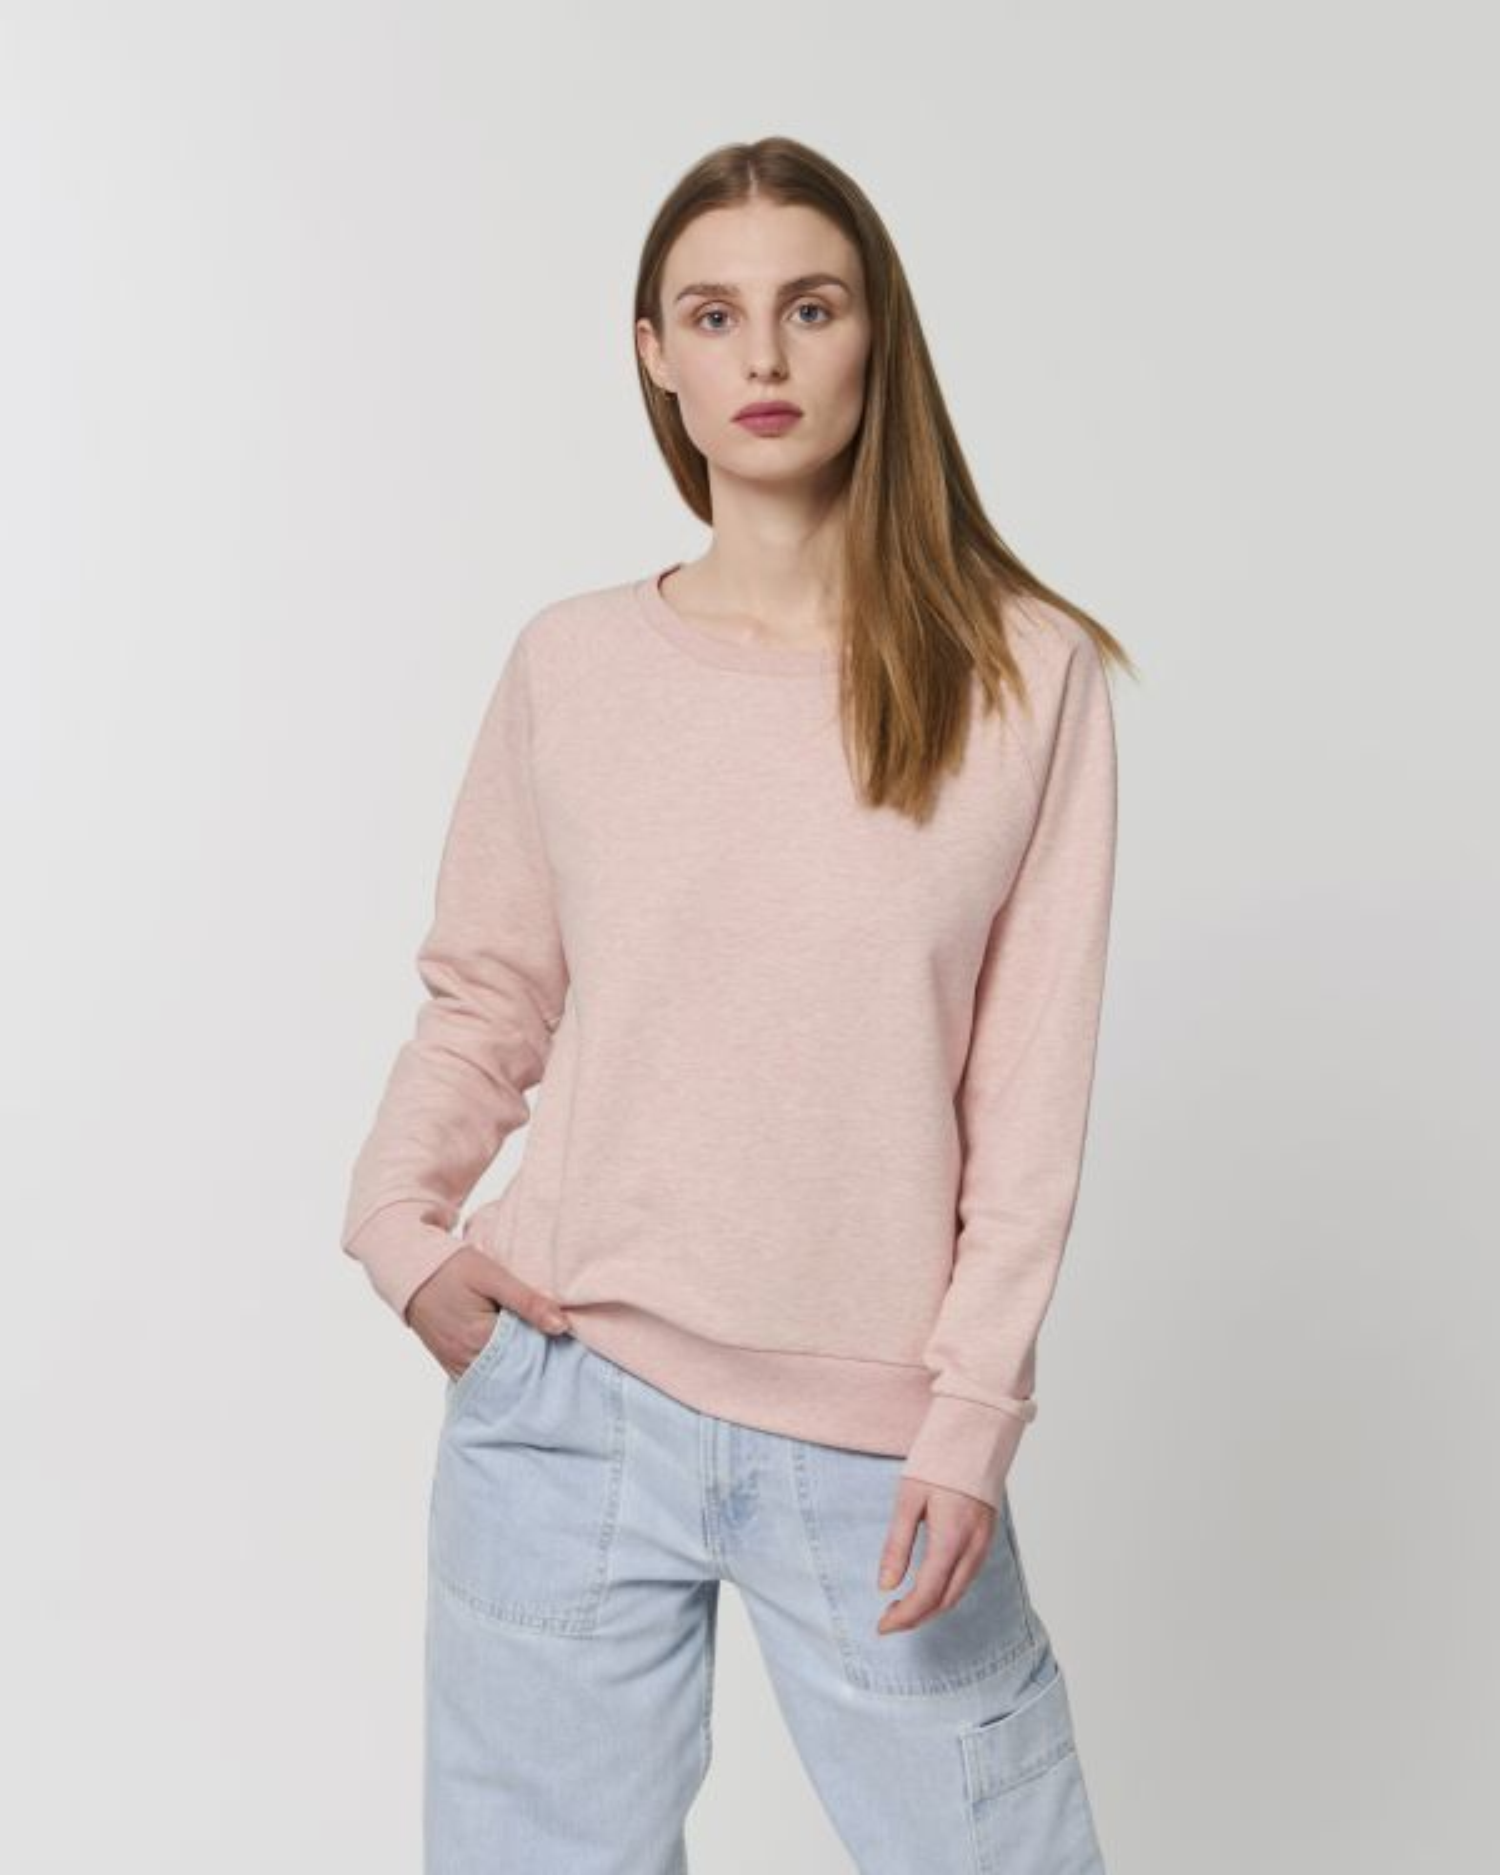 Stella Dazzler - Le sweat-shirt loose femme